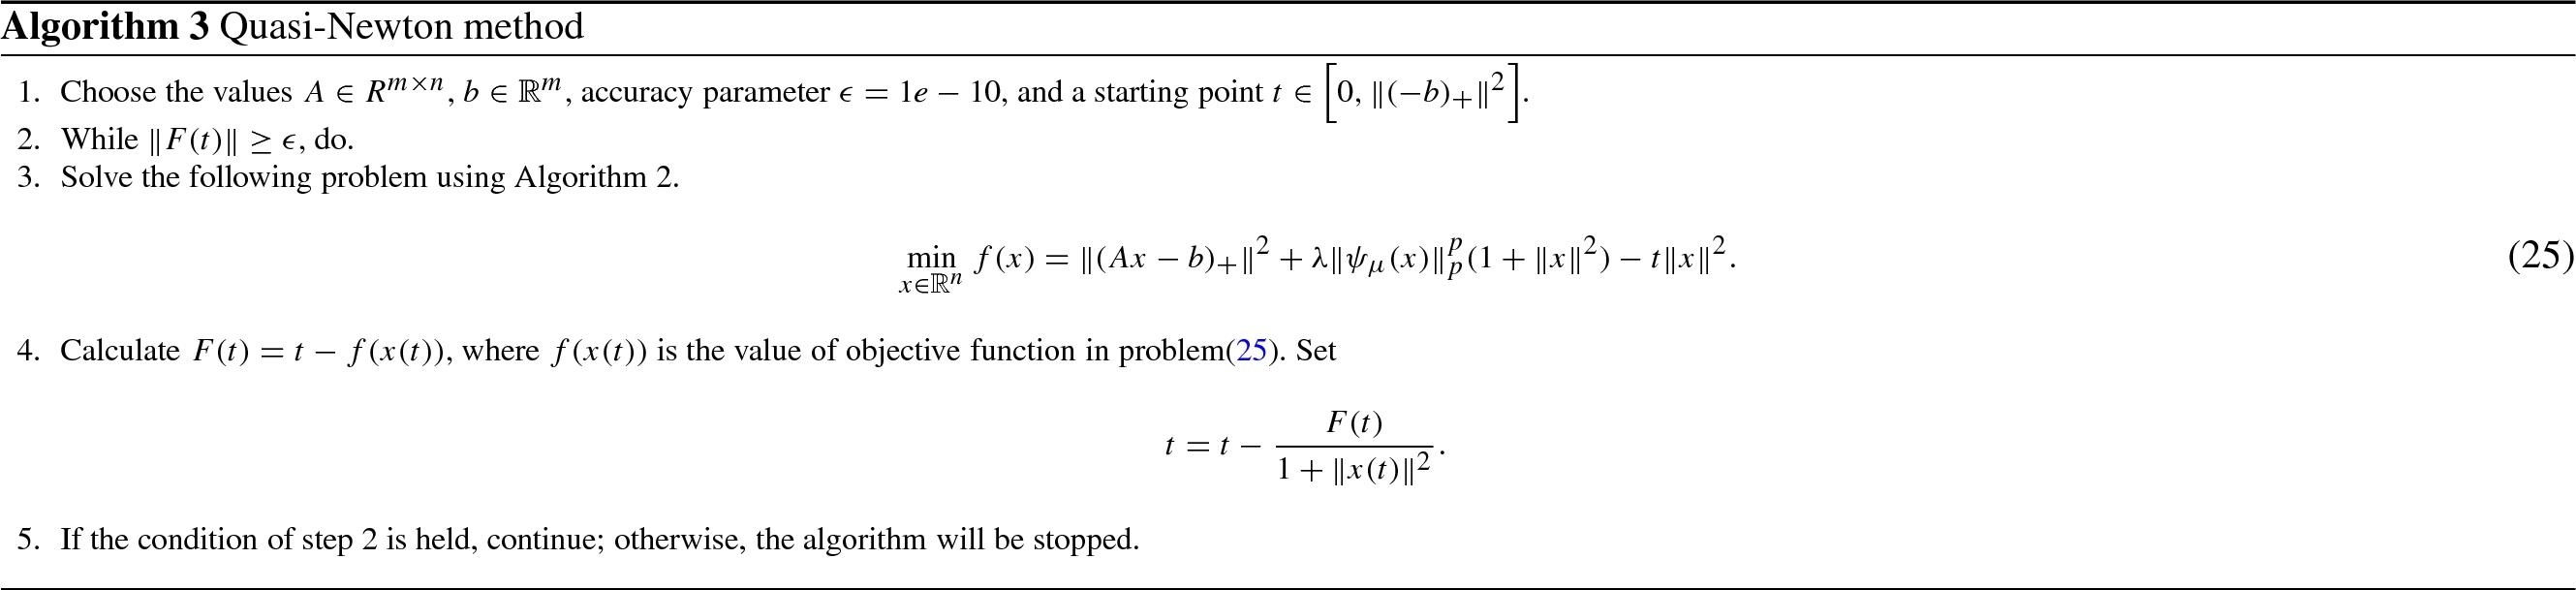 equation]-Norm Regularization Method [equation] and DC